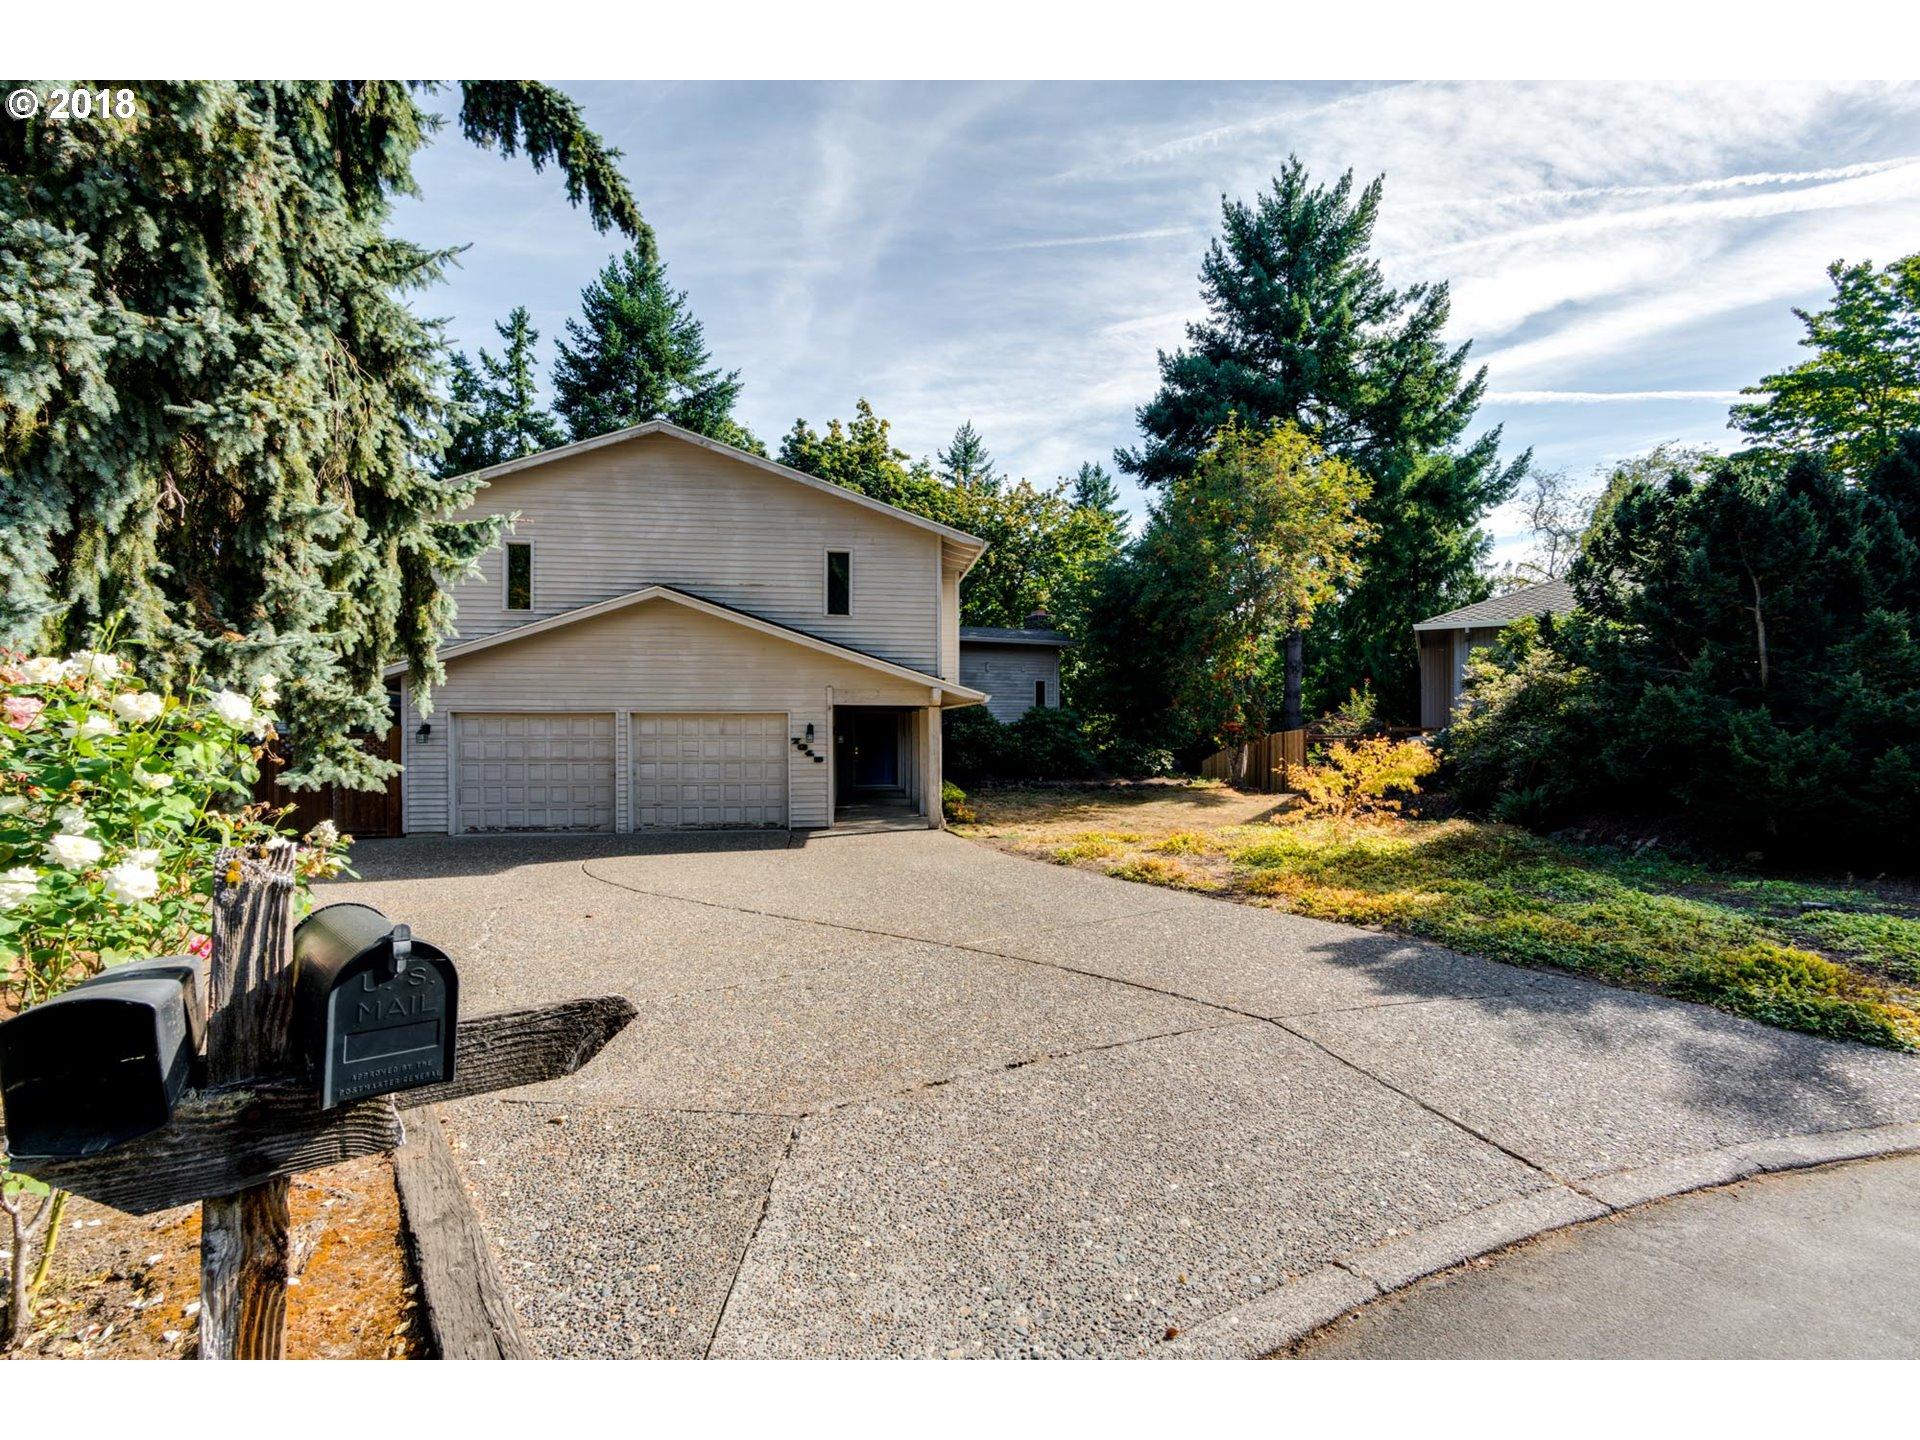 7345 SW PINERIDGE CT Portland, OR 97225 - MLS #: 18324316